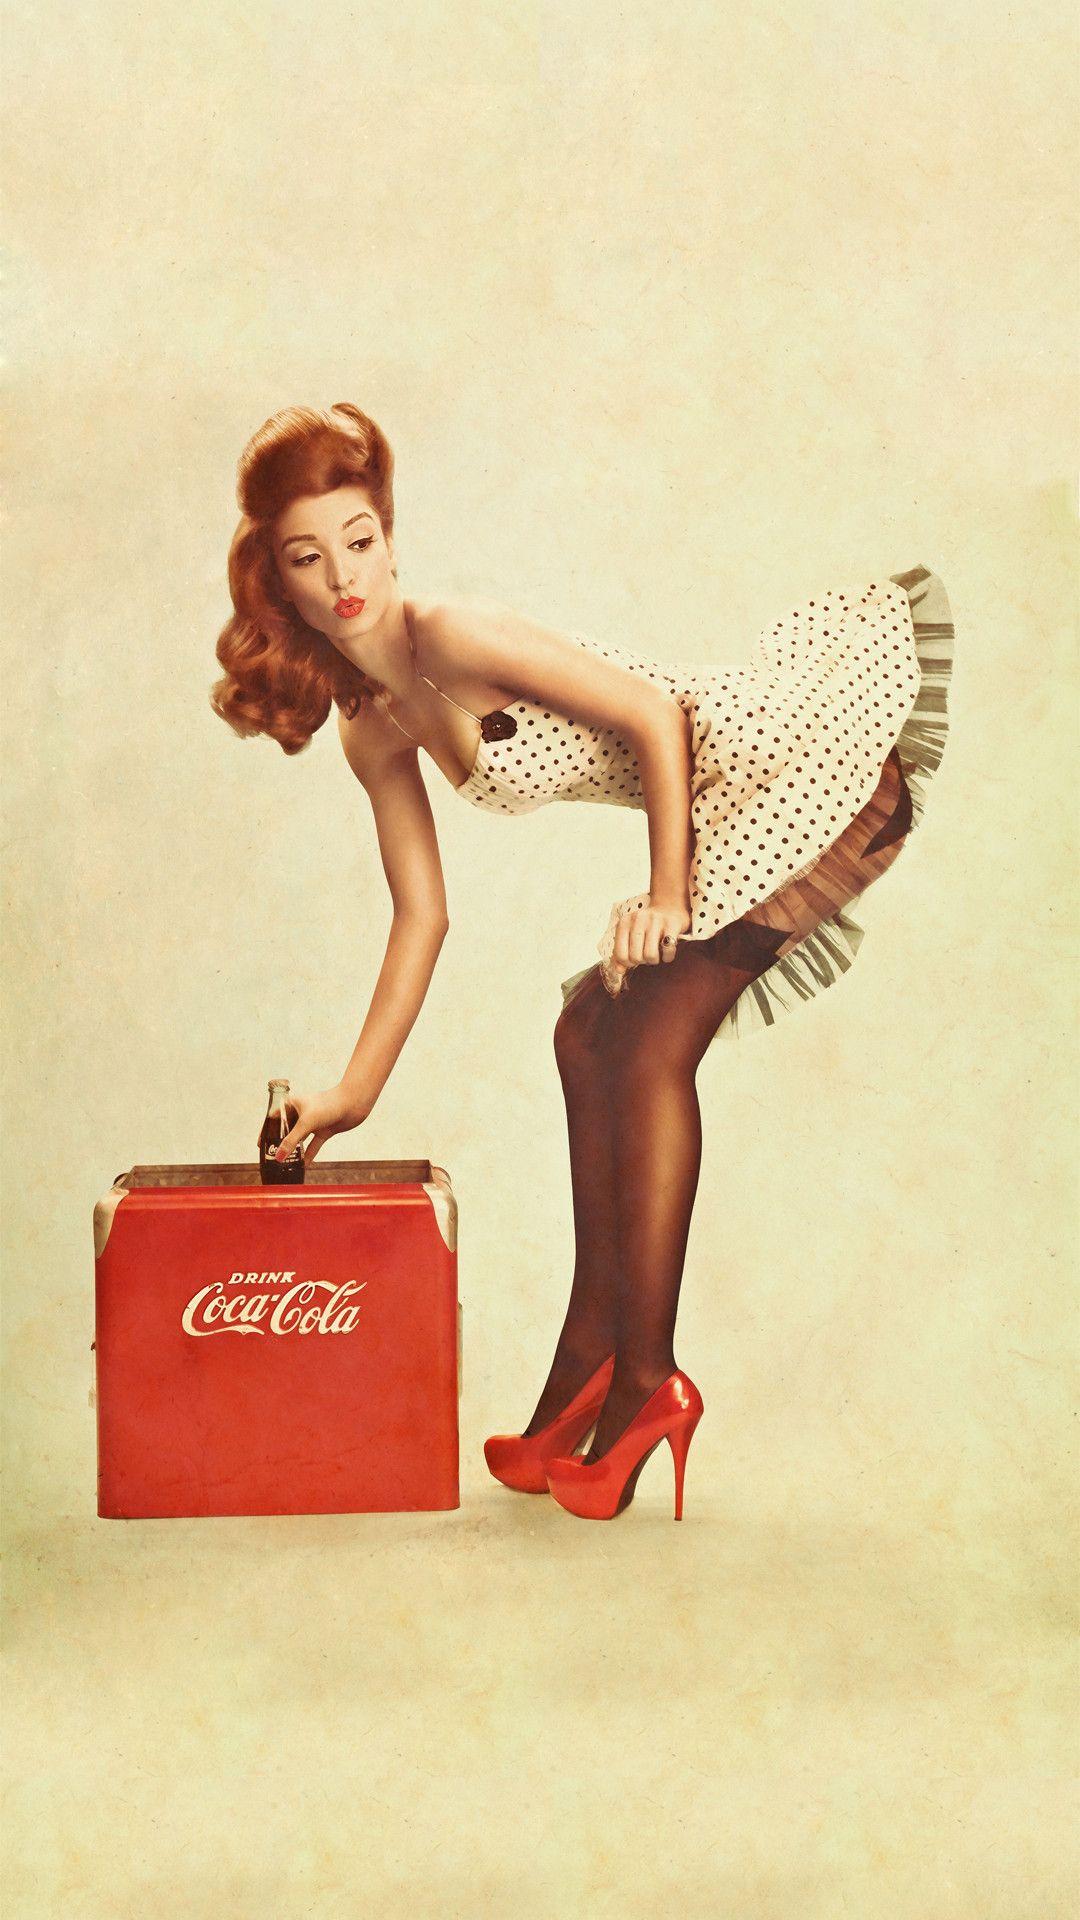 d10617efeb Coca Cola Pin Up Girl iPhone Wallpaper